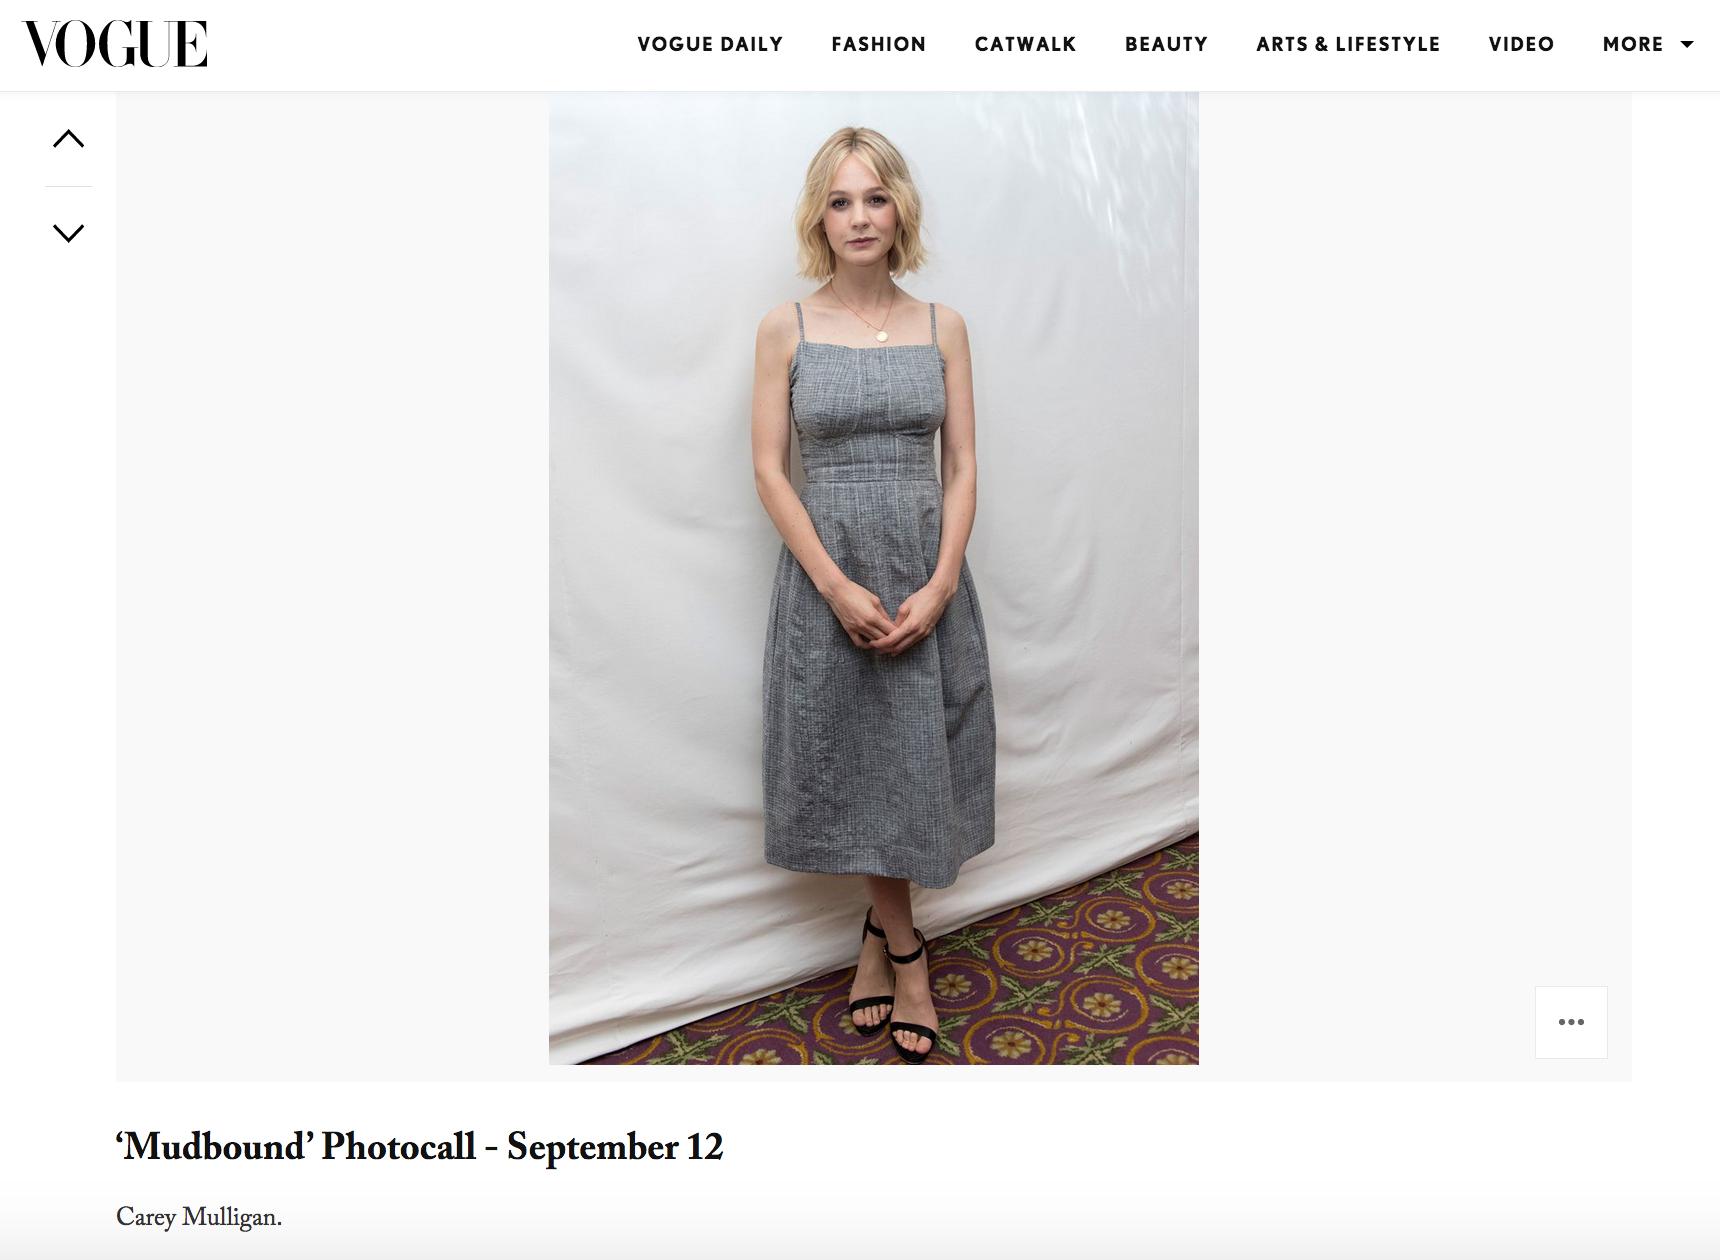 Vogue Online Press Carey Mulligan Mudbound Photocall TIFF in Toronto Fur & Claw pendant by Bear Brooksbank